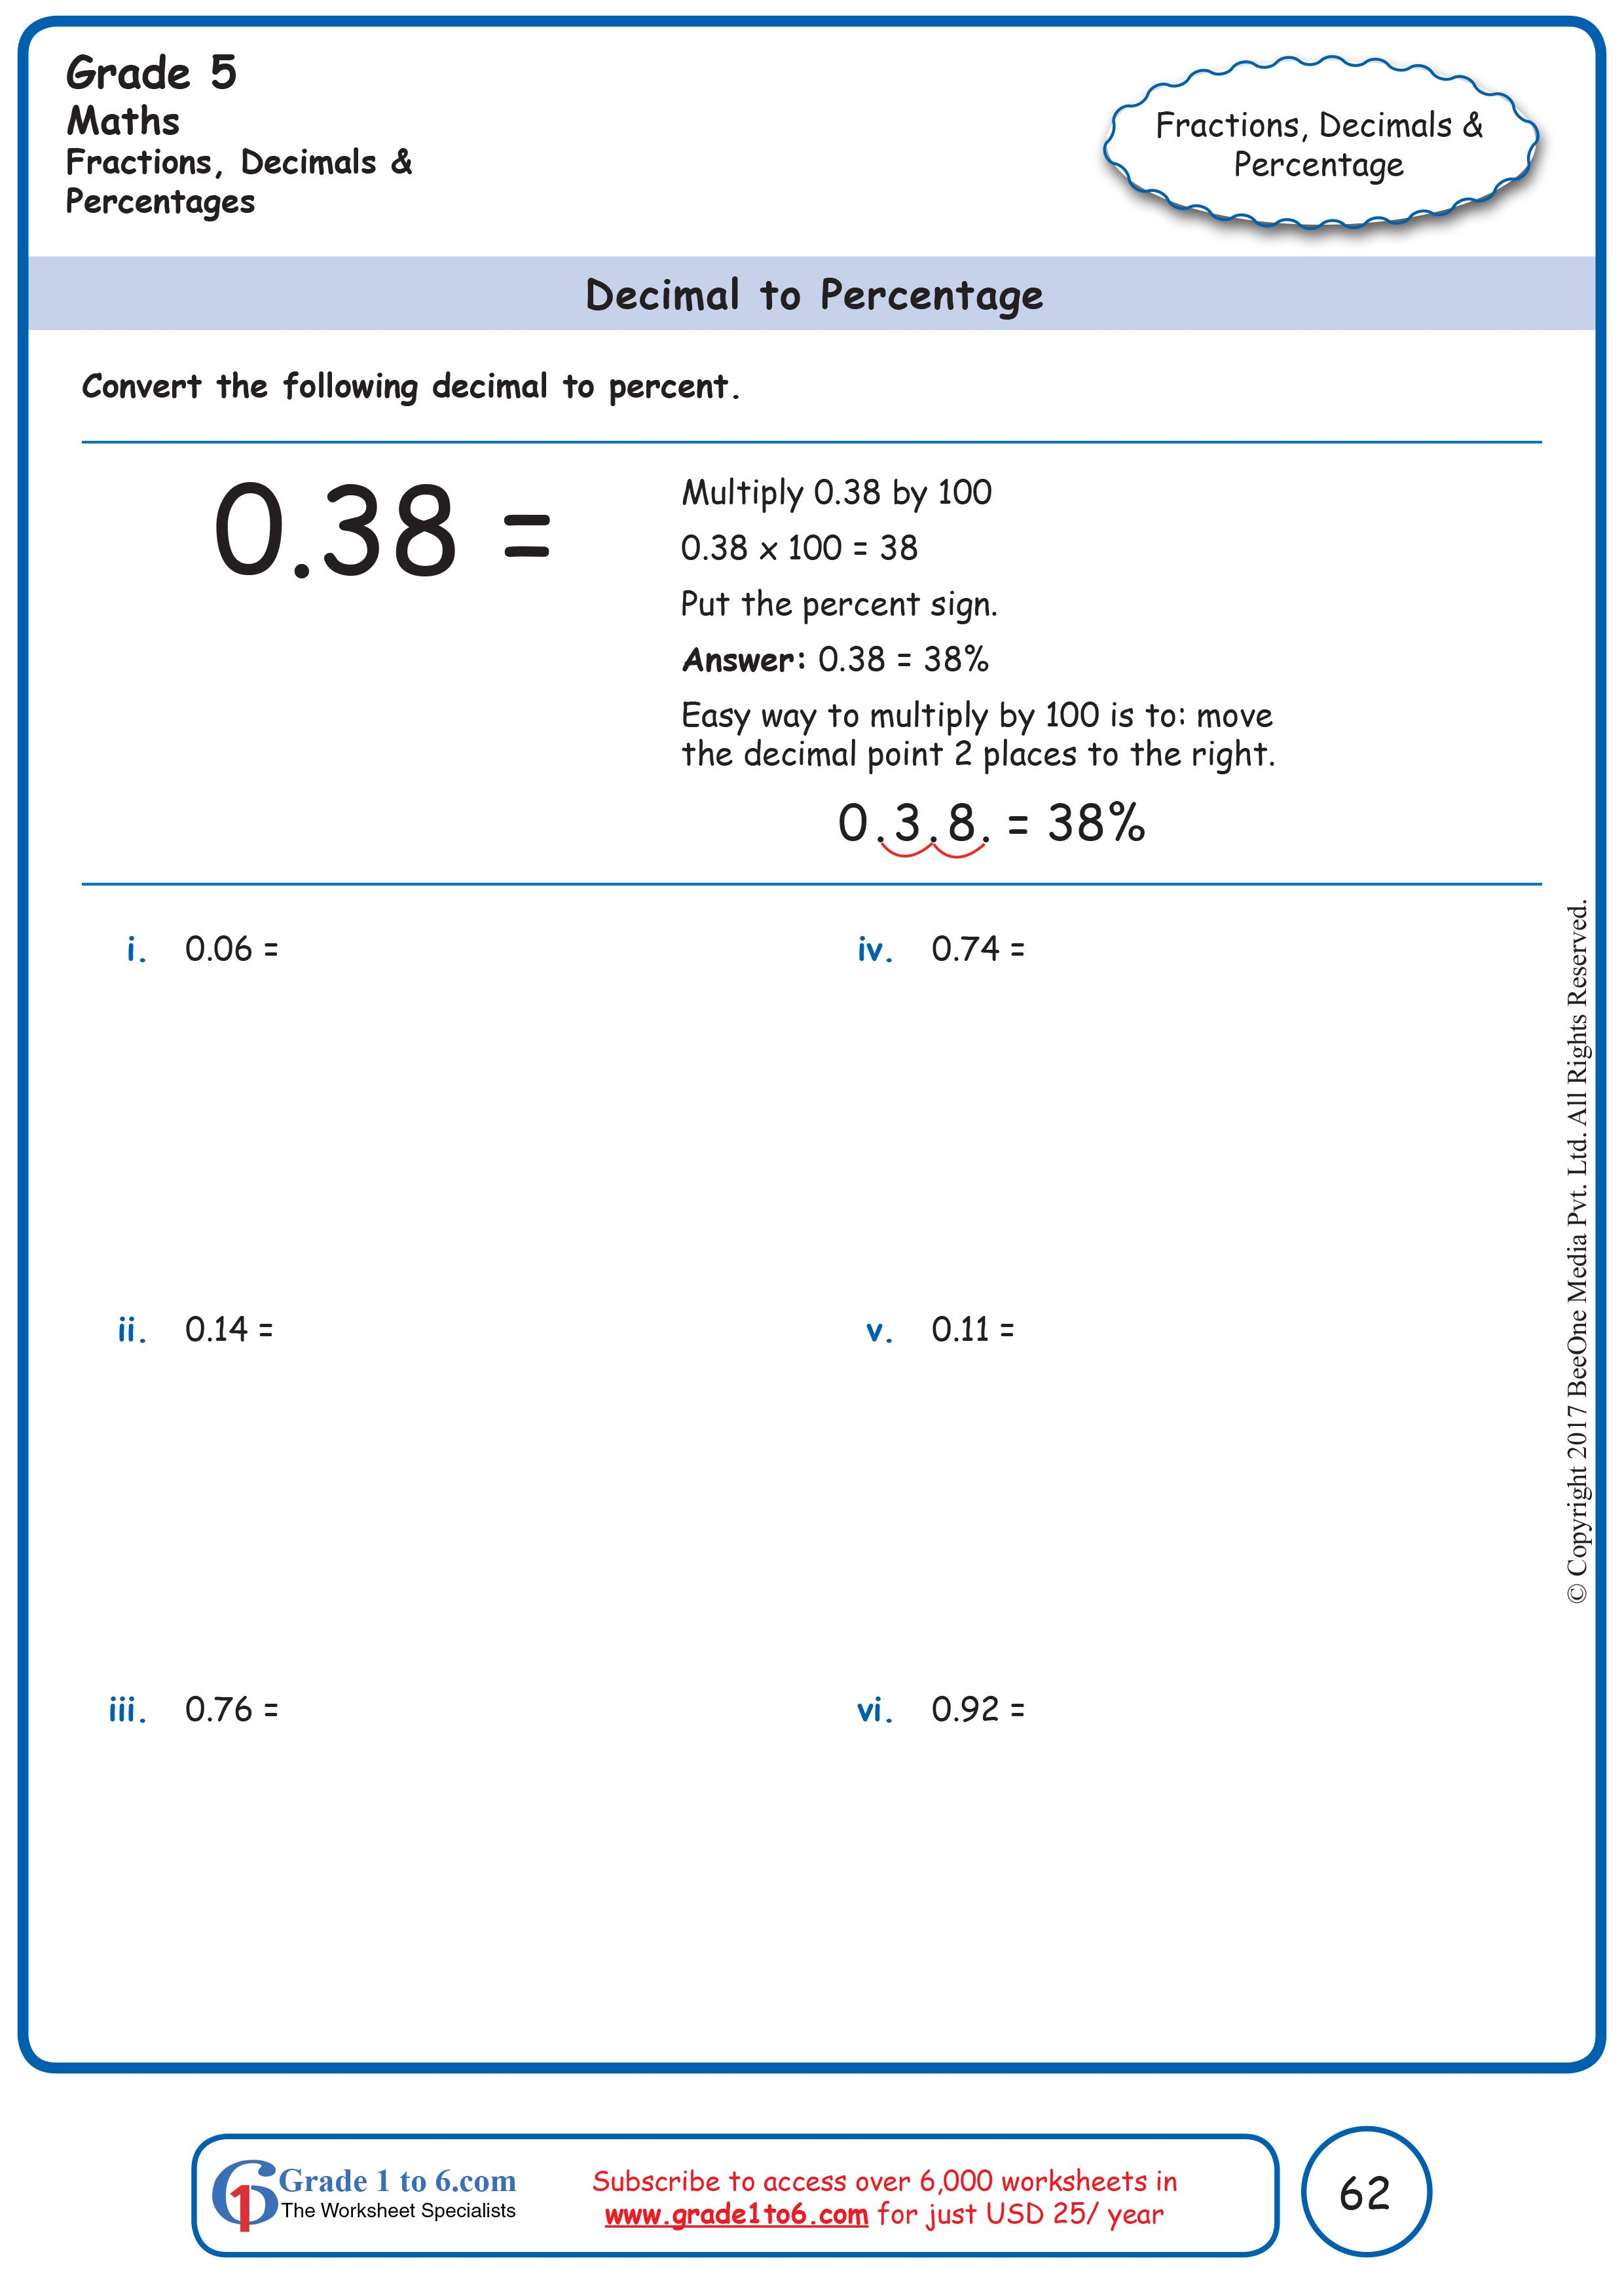 small resolution of Science \u0026 Math Decimals Grade 6 Workbook Books elektroelement.com.mk